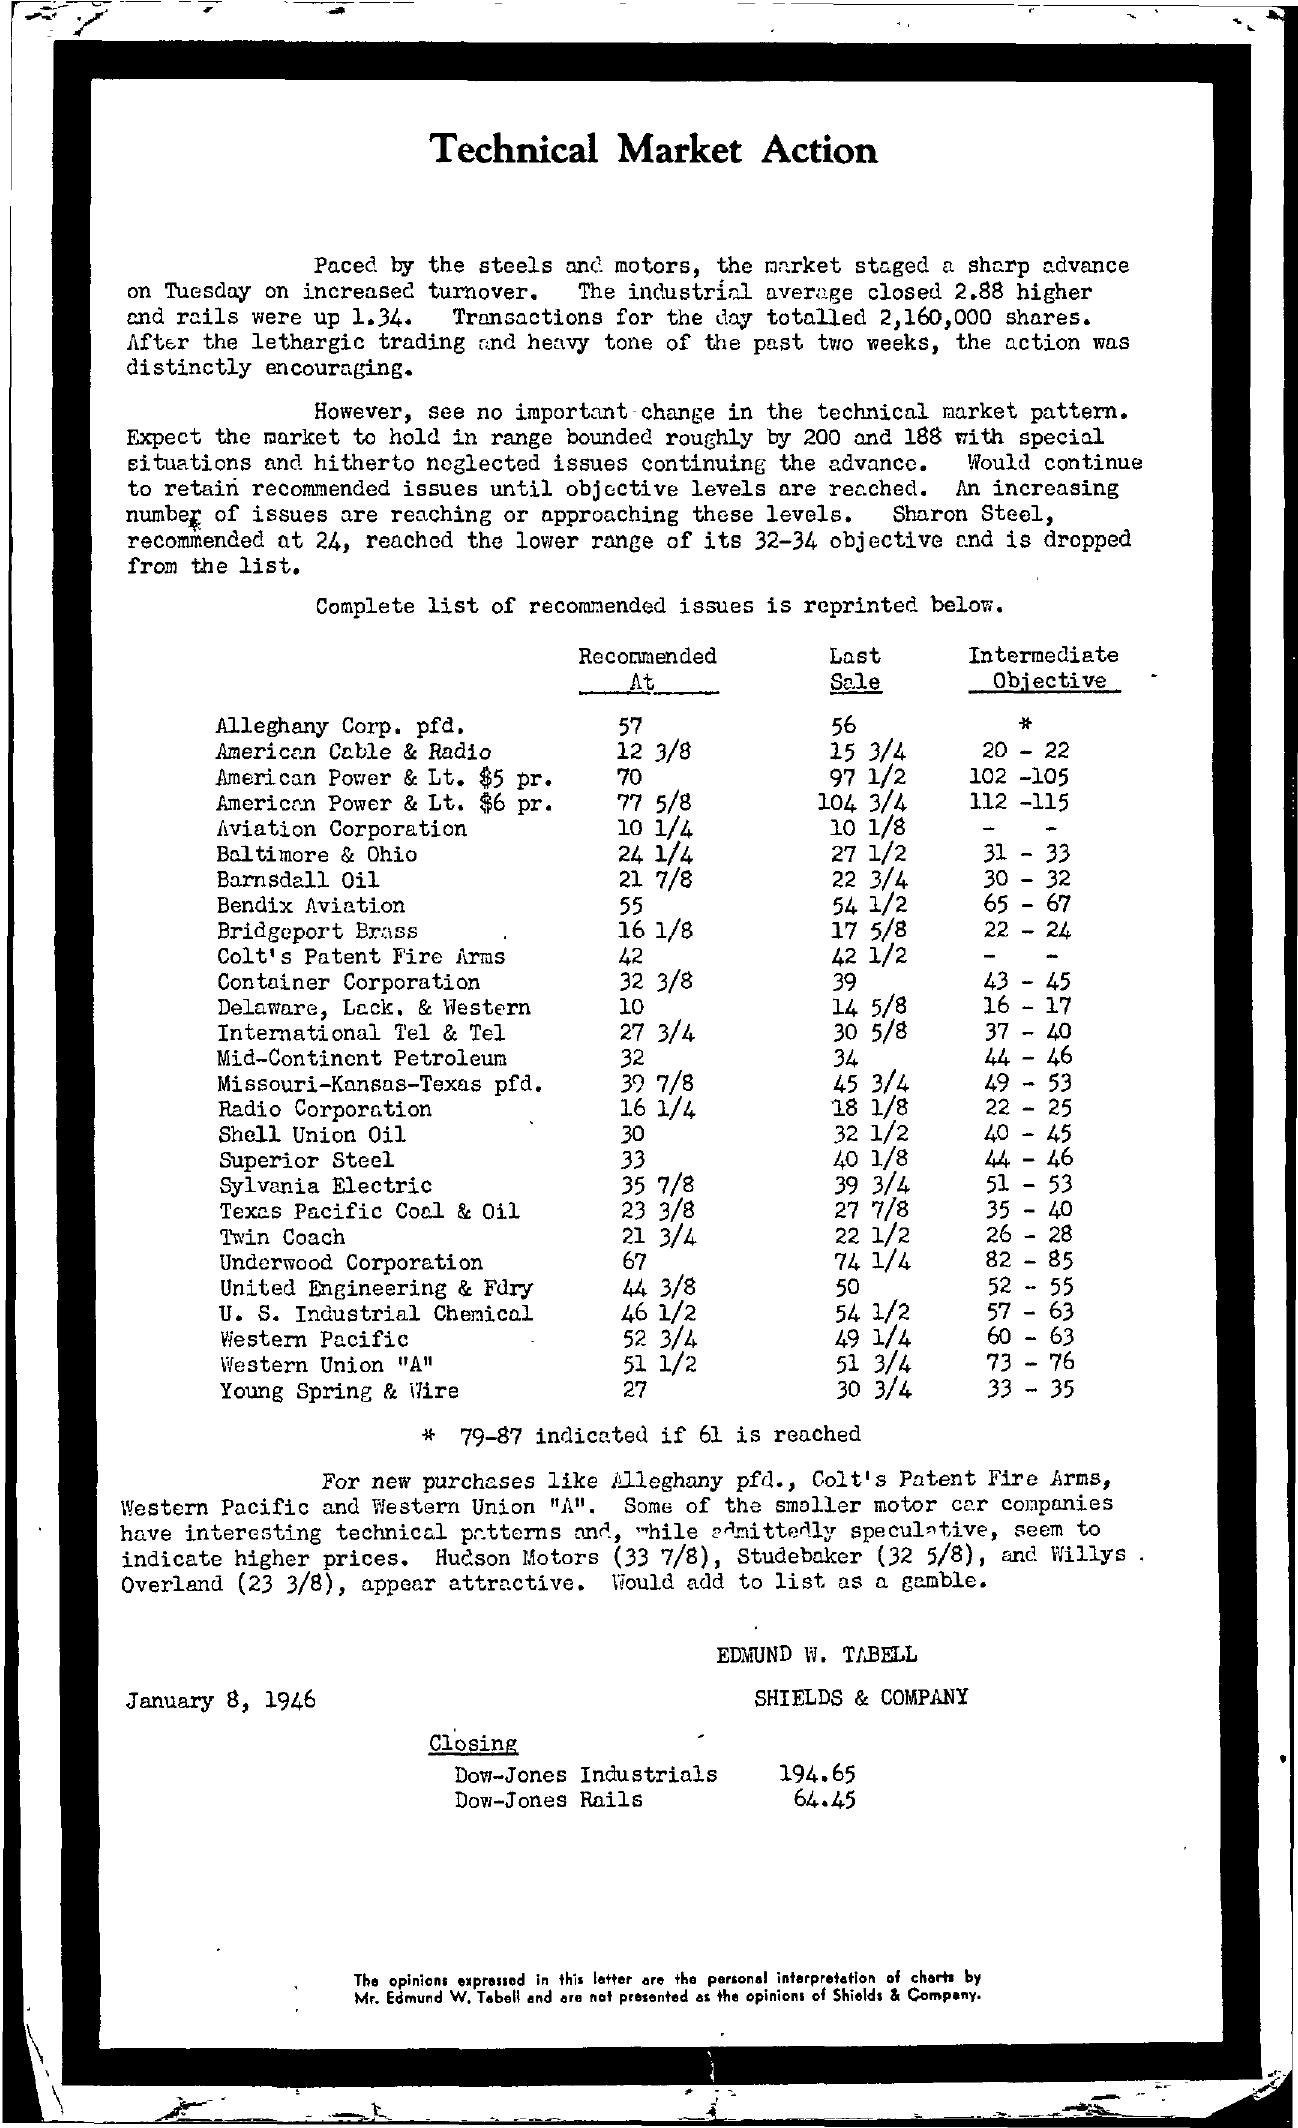 Tabell's Market Letter - January 08, 1946